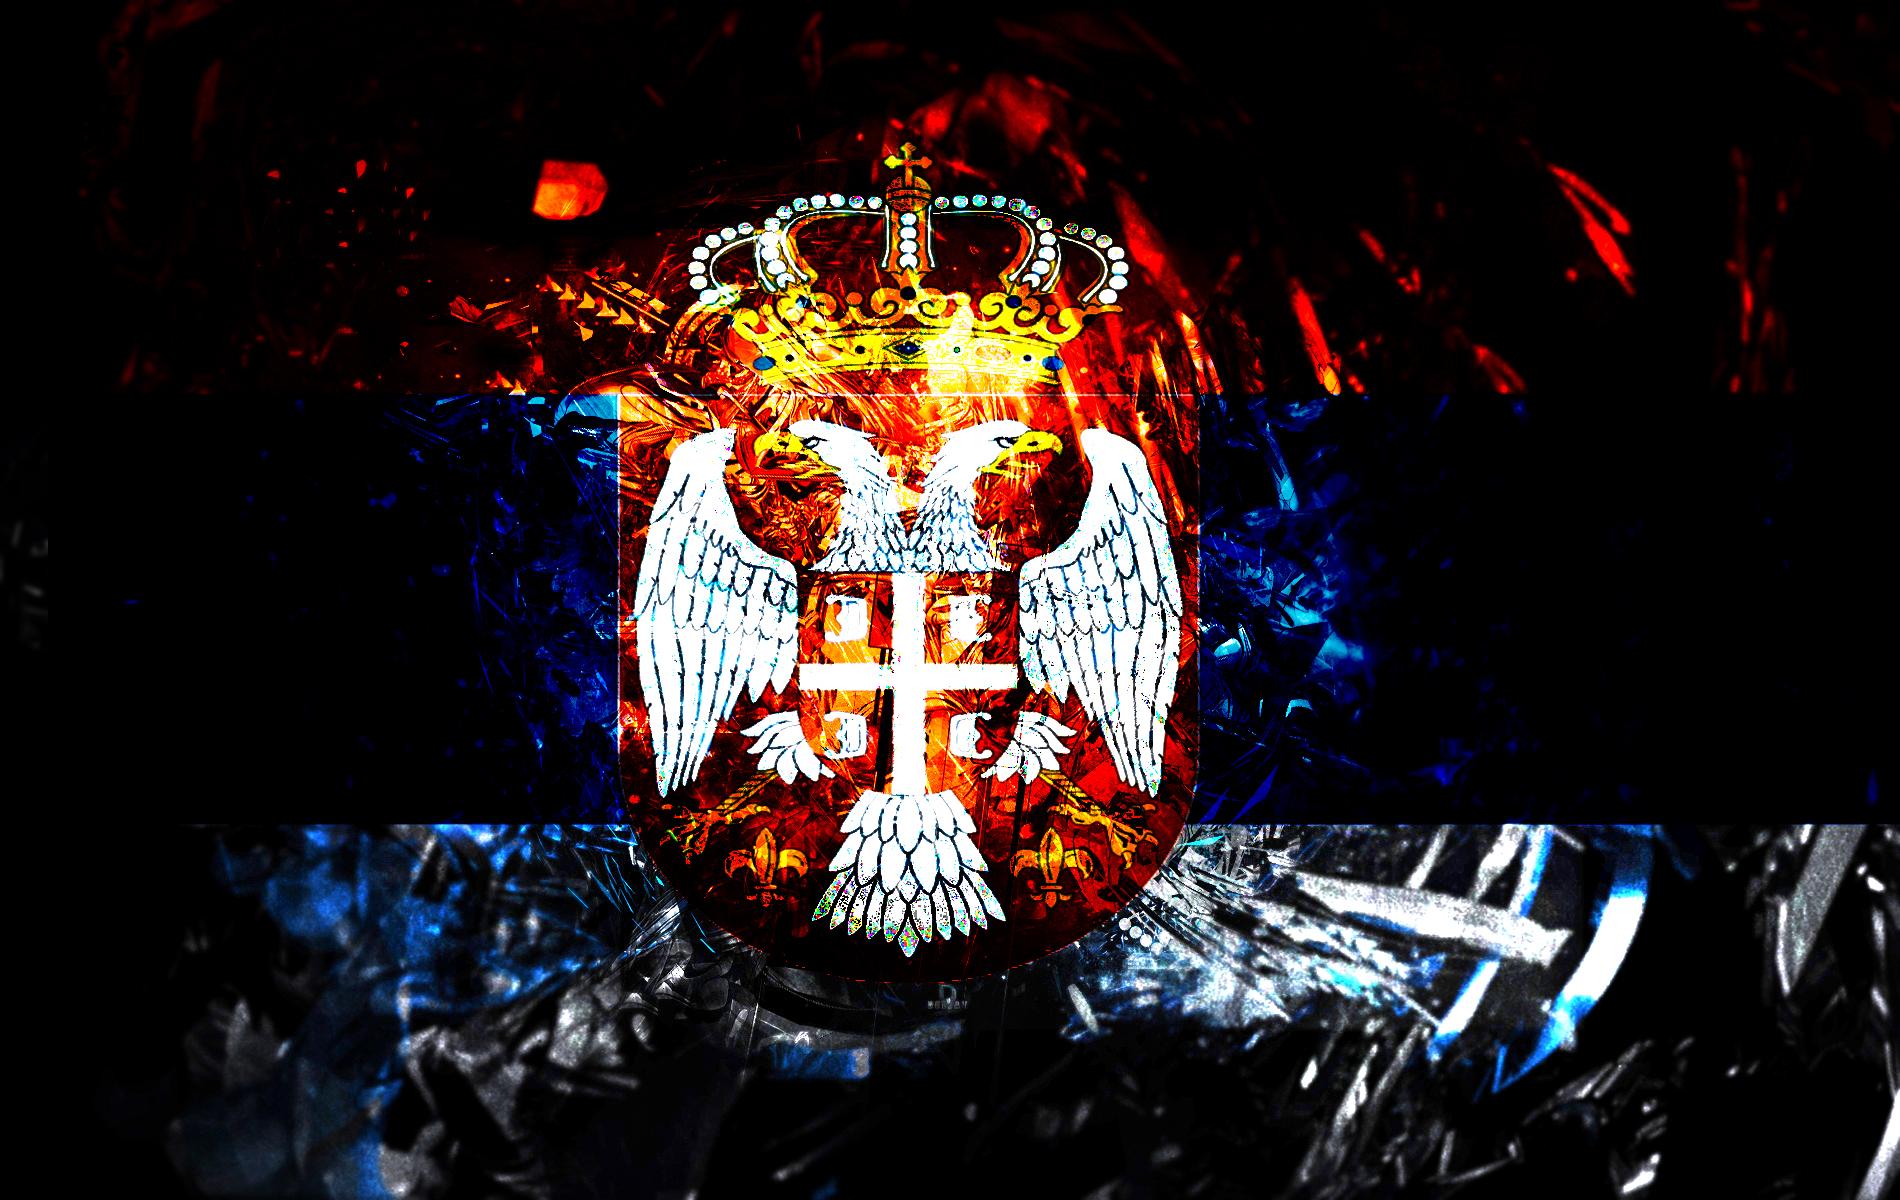 serbian eagle by stoykeez customization wallpaper political 2012 2015 1900x1200